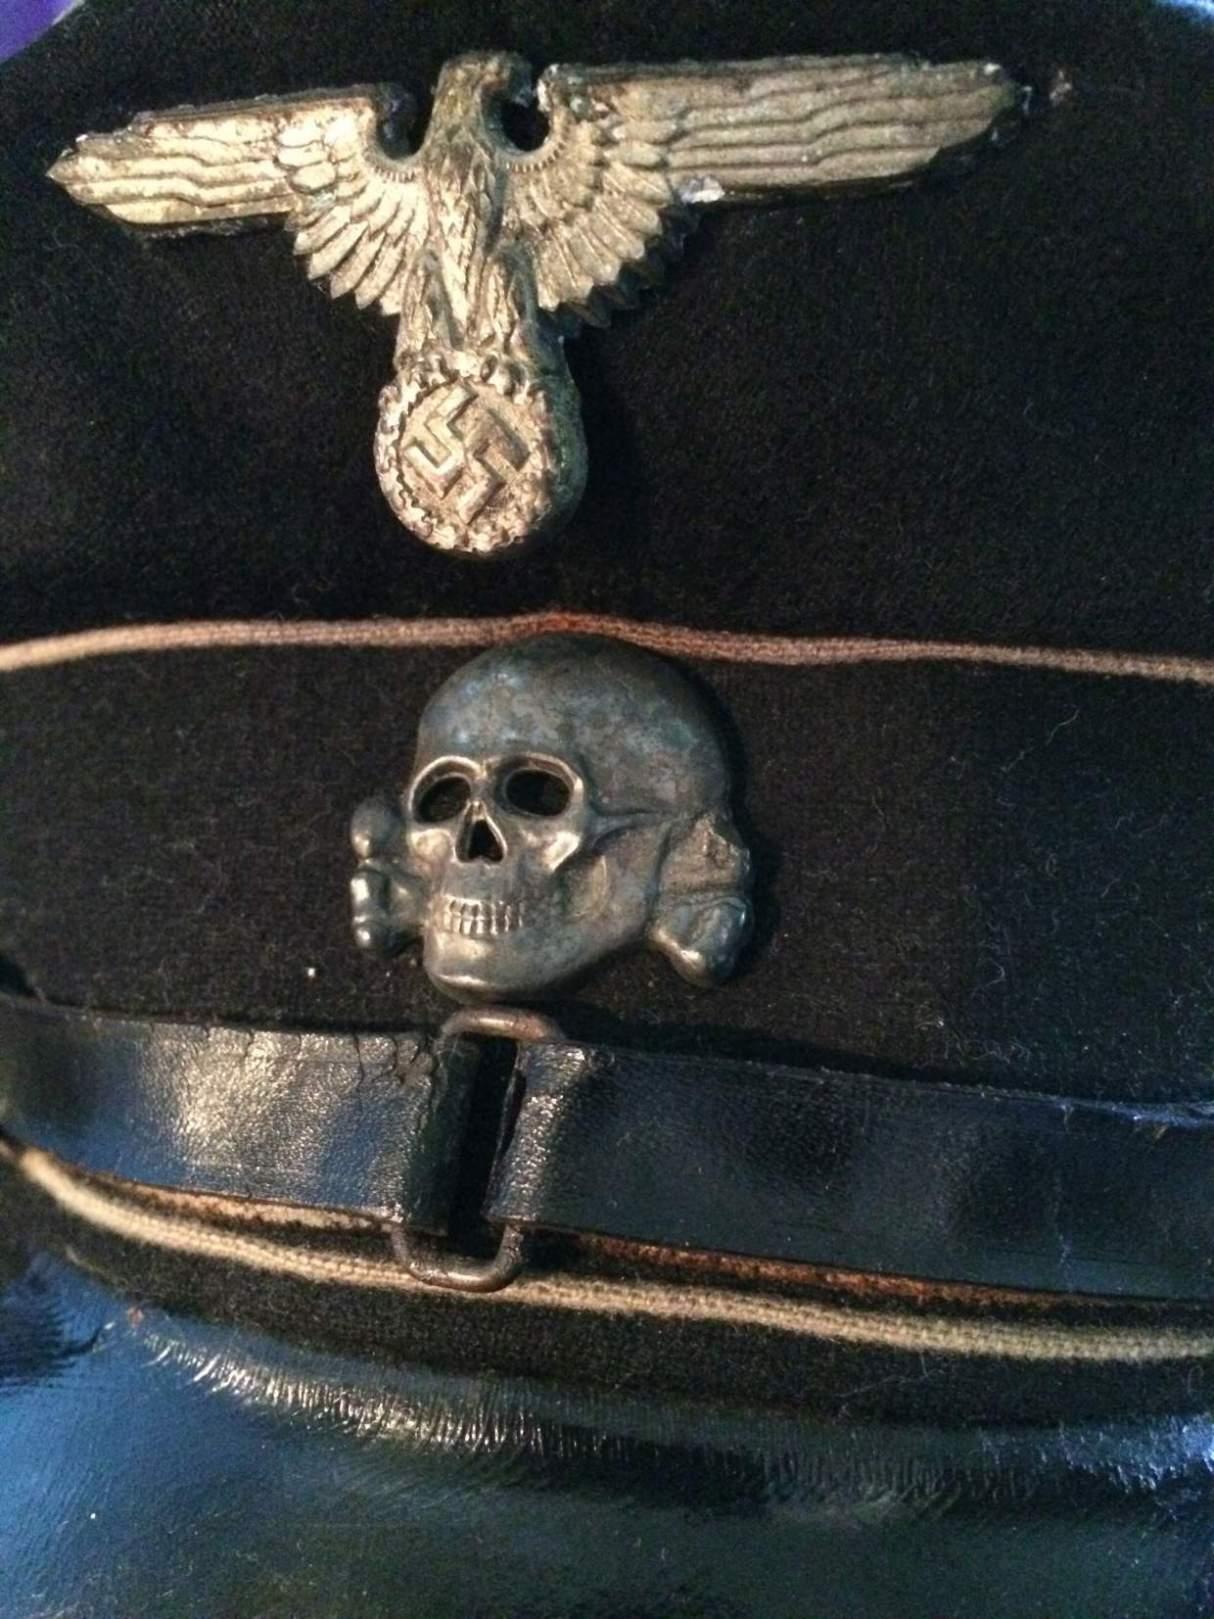 Totenkopf ss button